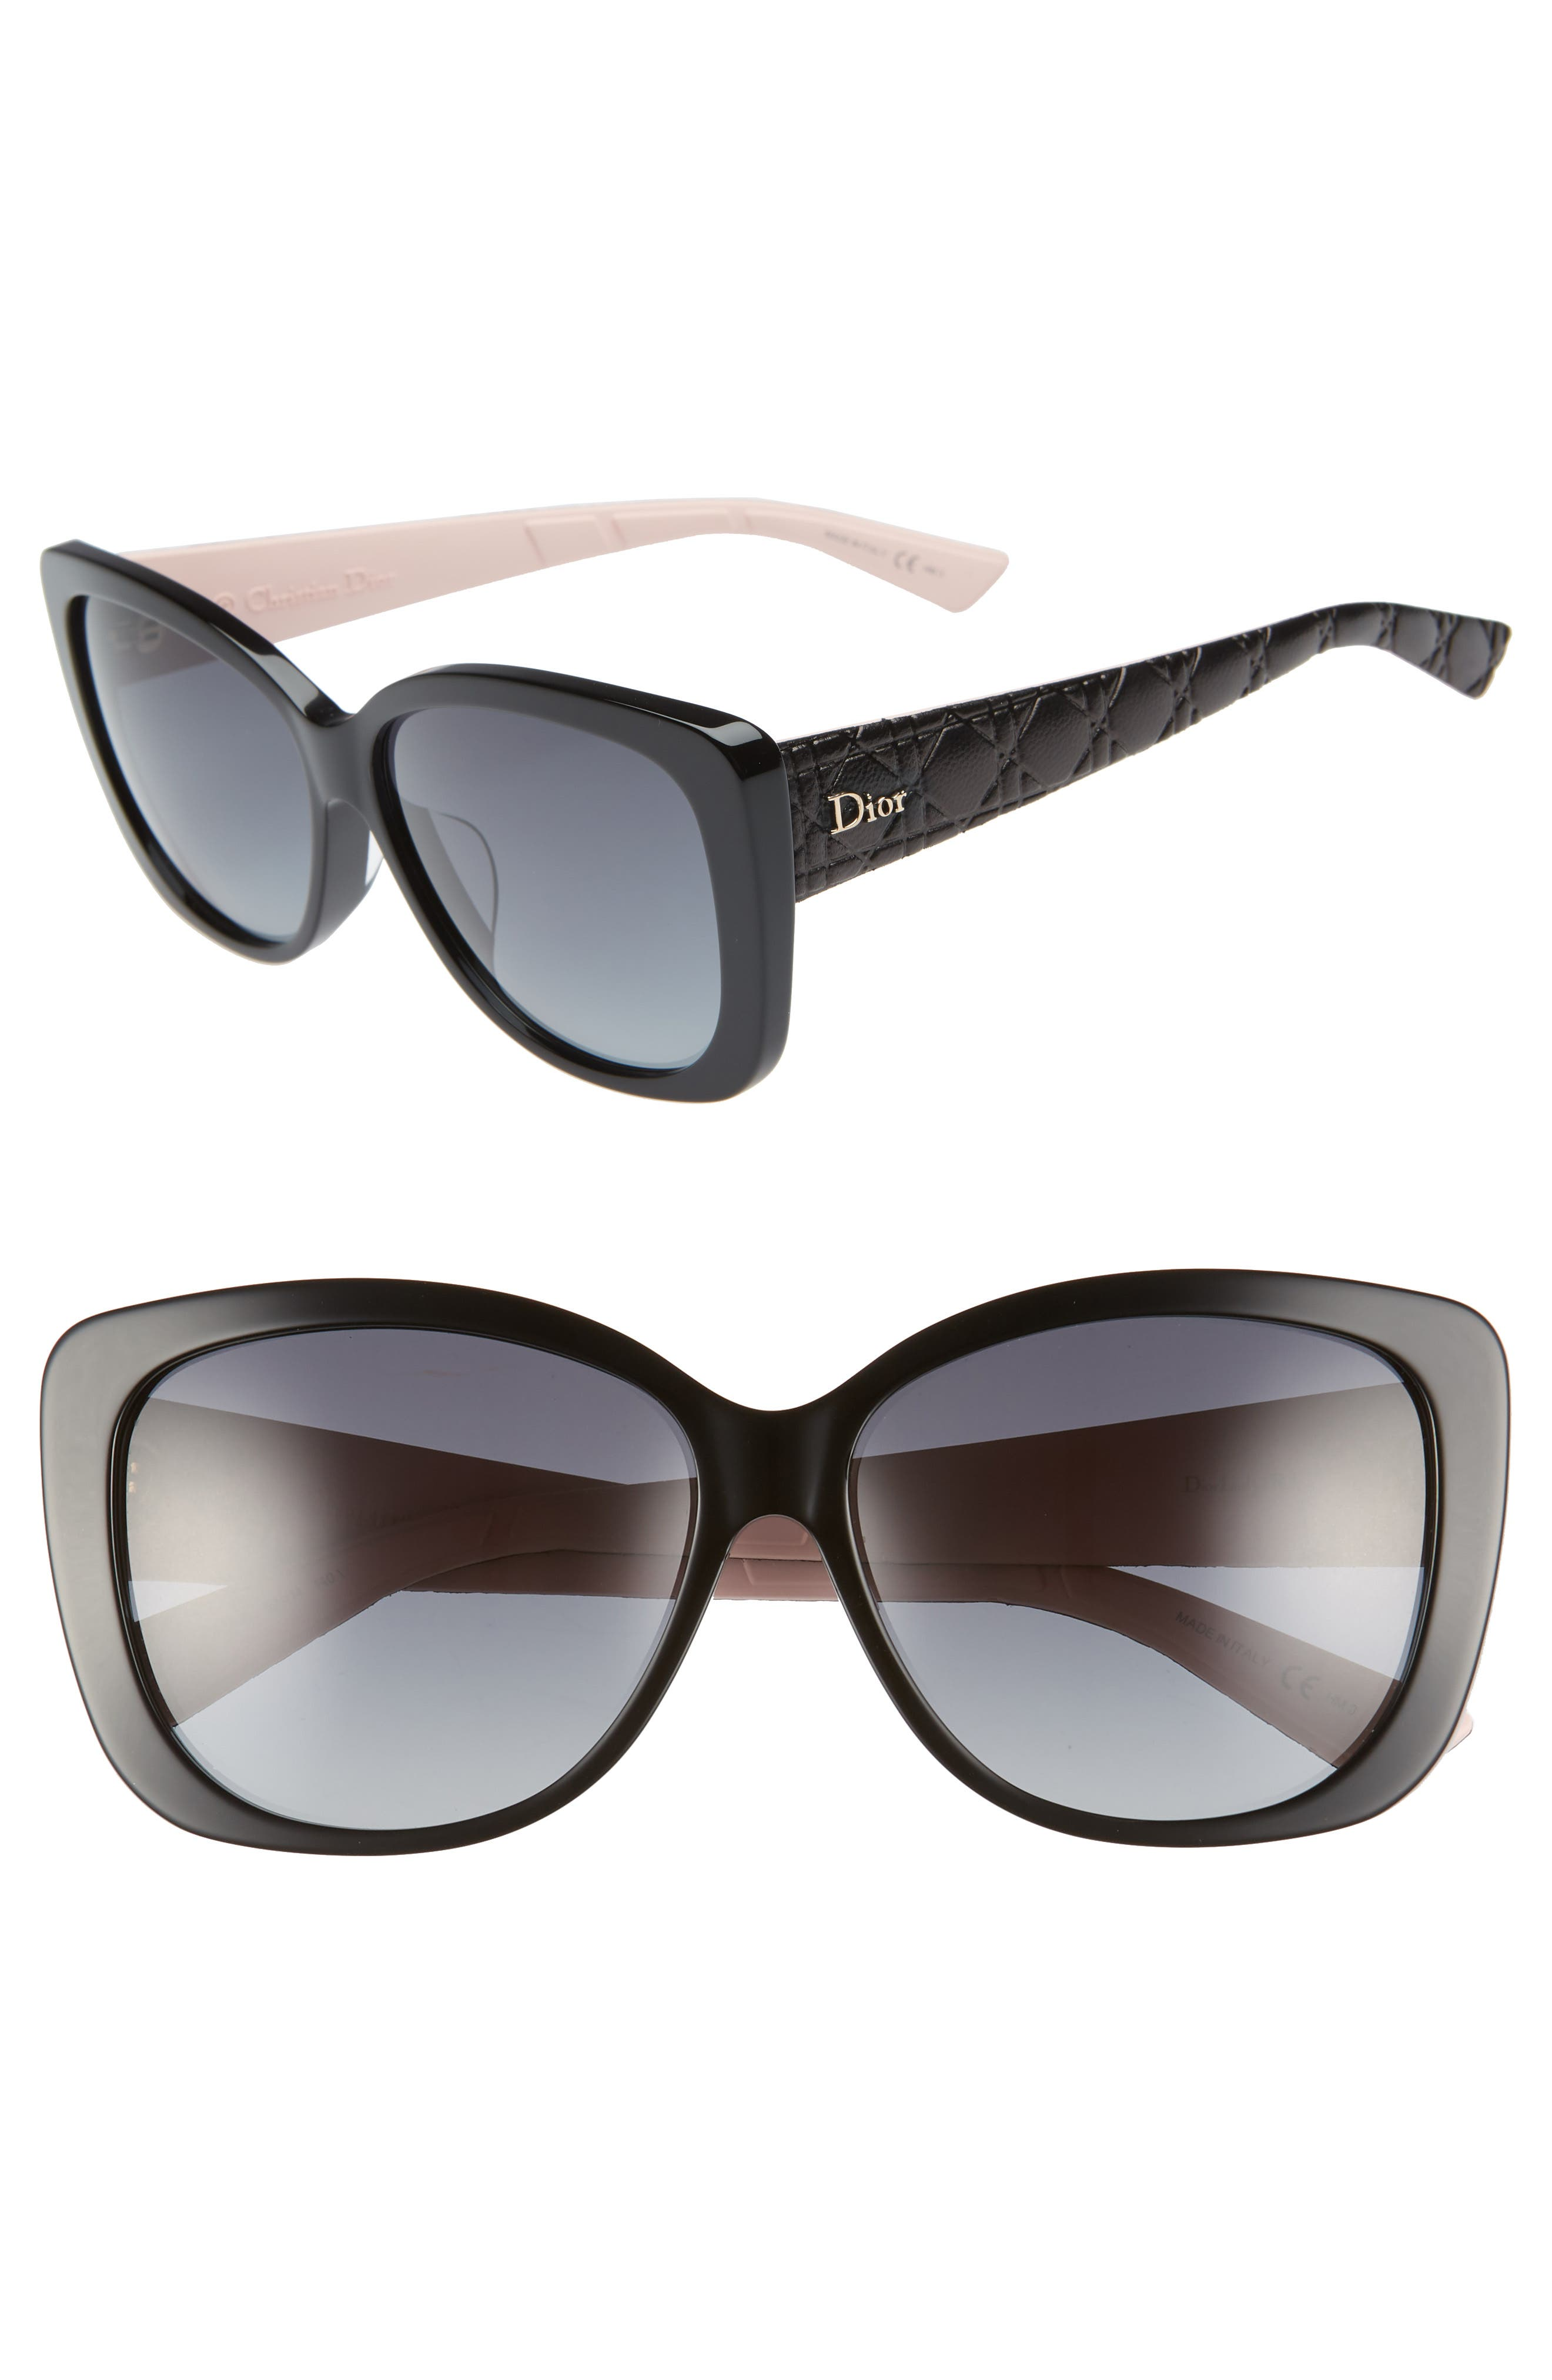 dac19208334 Dior lady cat eye sunglasses jpg 480x730 Dior cat eye glasses